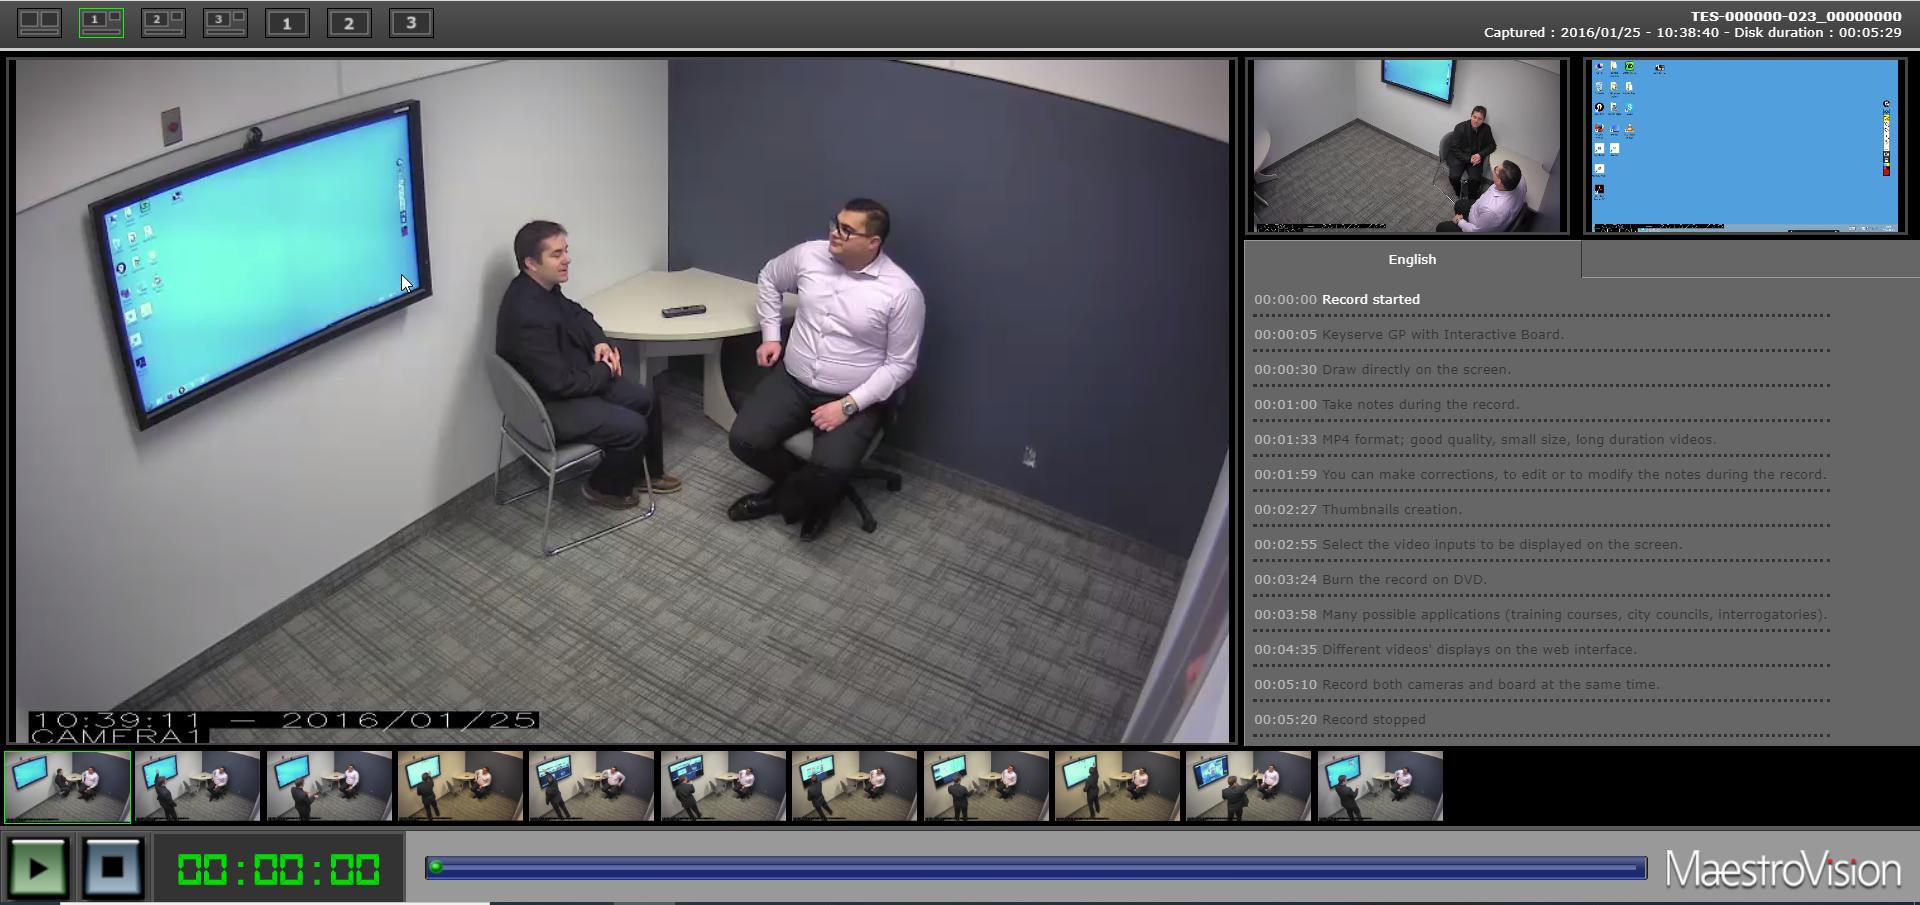 VEOTEK-gestionnaire de medias-enregistrements videos-maestrovision